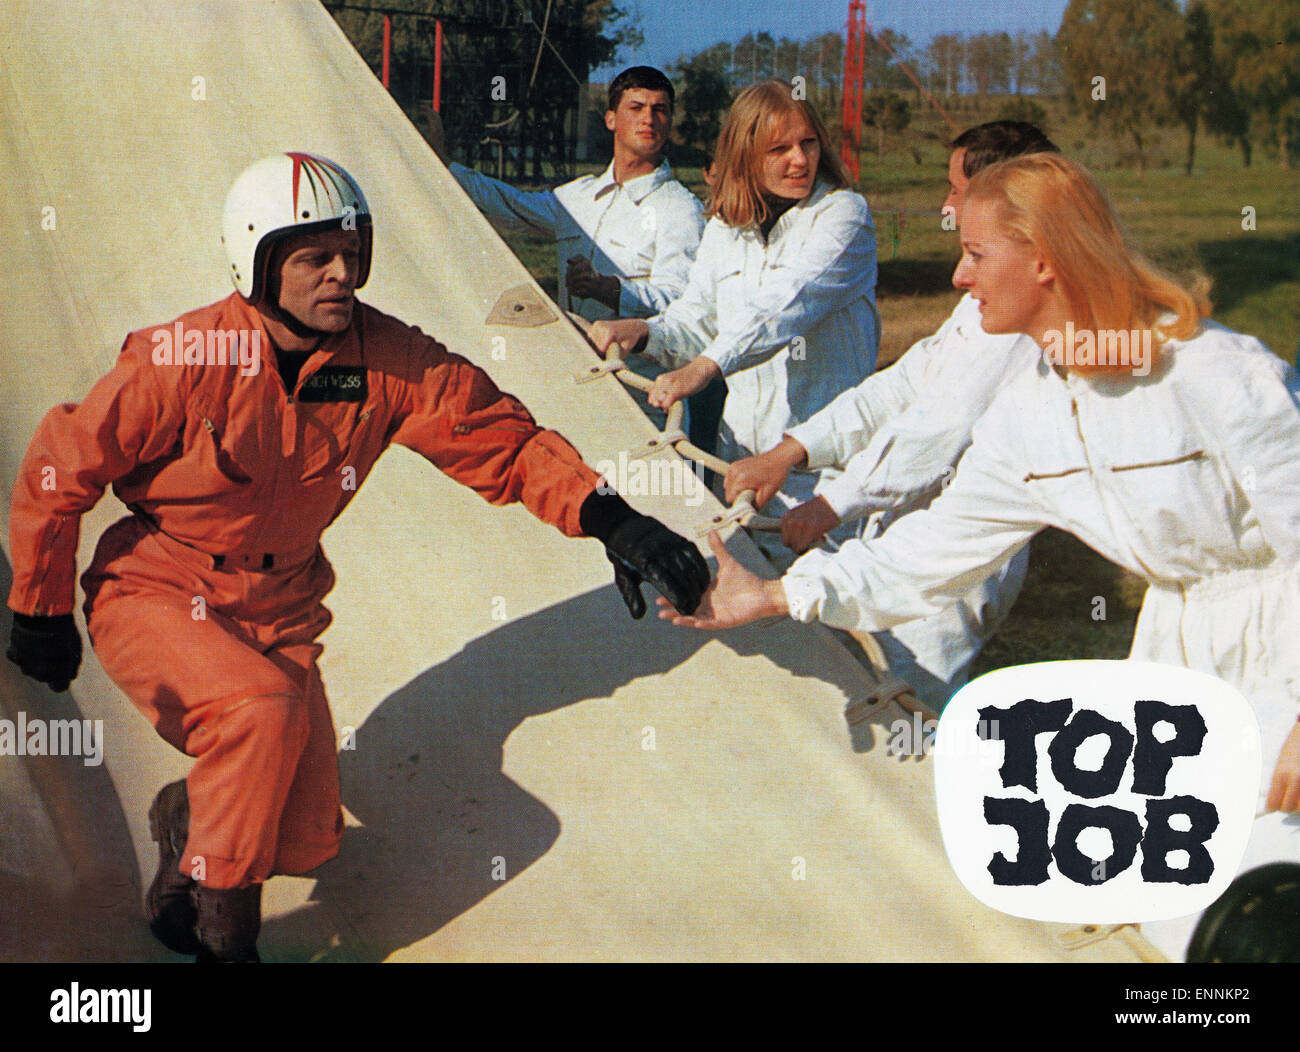 jobsjobs sri lanka best job site hostel jobs assistant manager jobsjobs sri lanka best job site top job top job accents alex